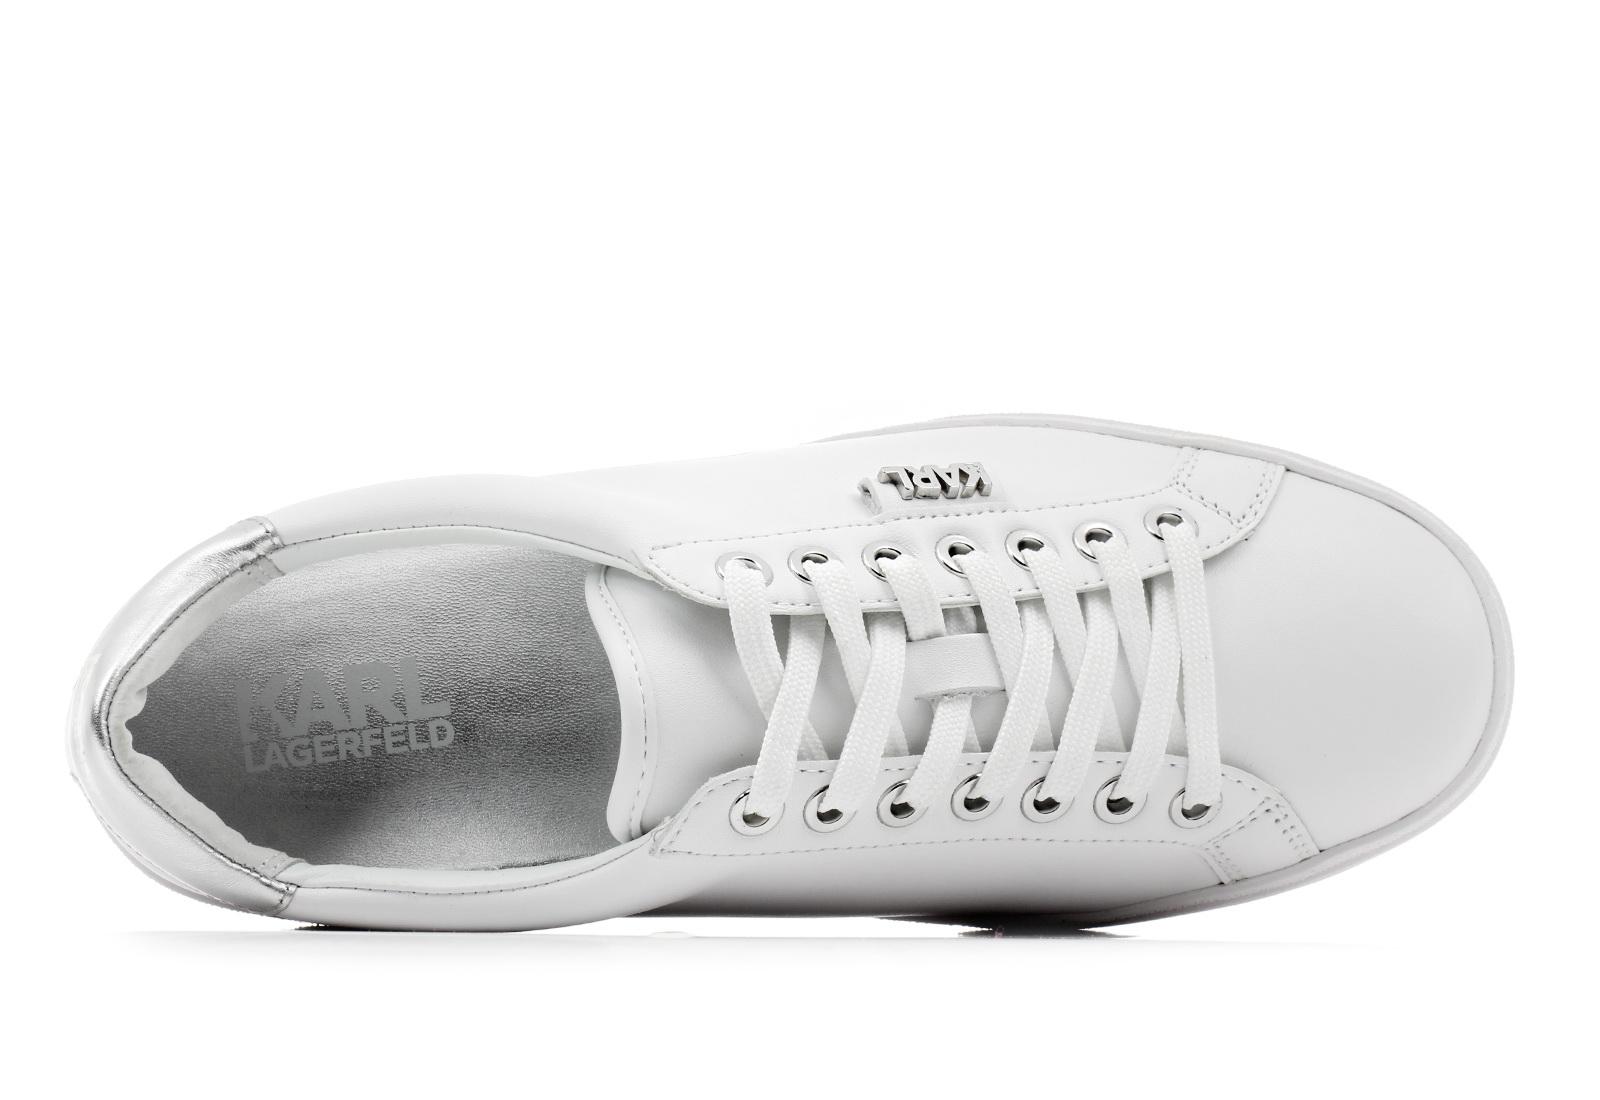 05272a484e Karl Lagerfeld Shoes - Skool Karl Ikonic - KL60101-011 - Online shop ...